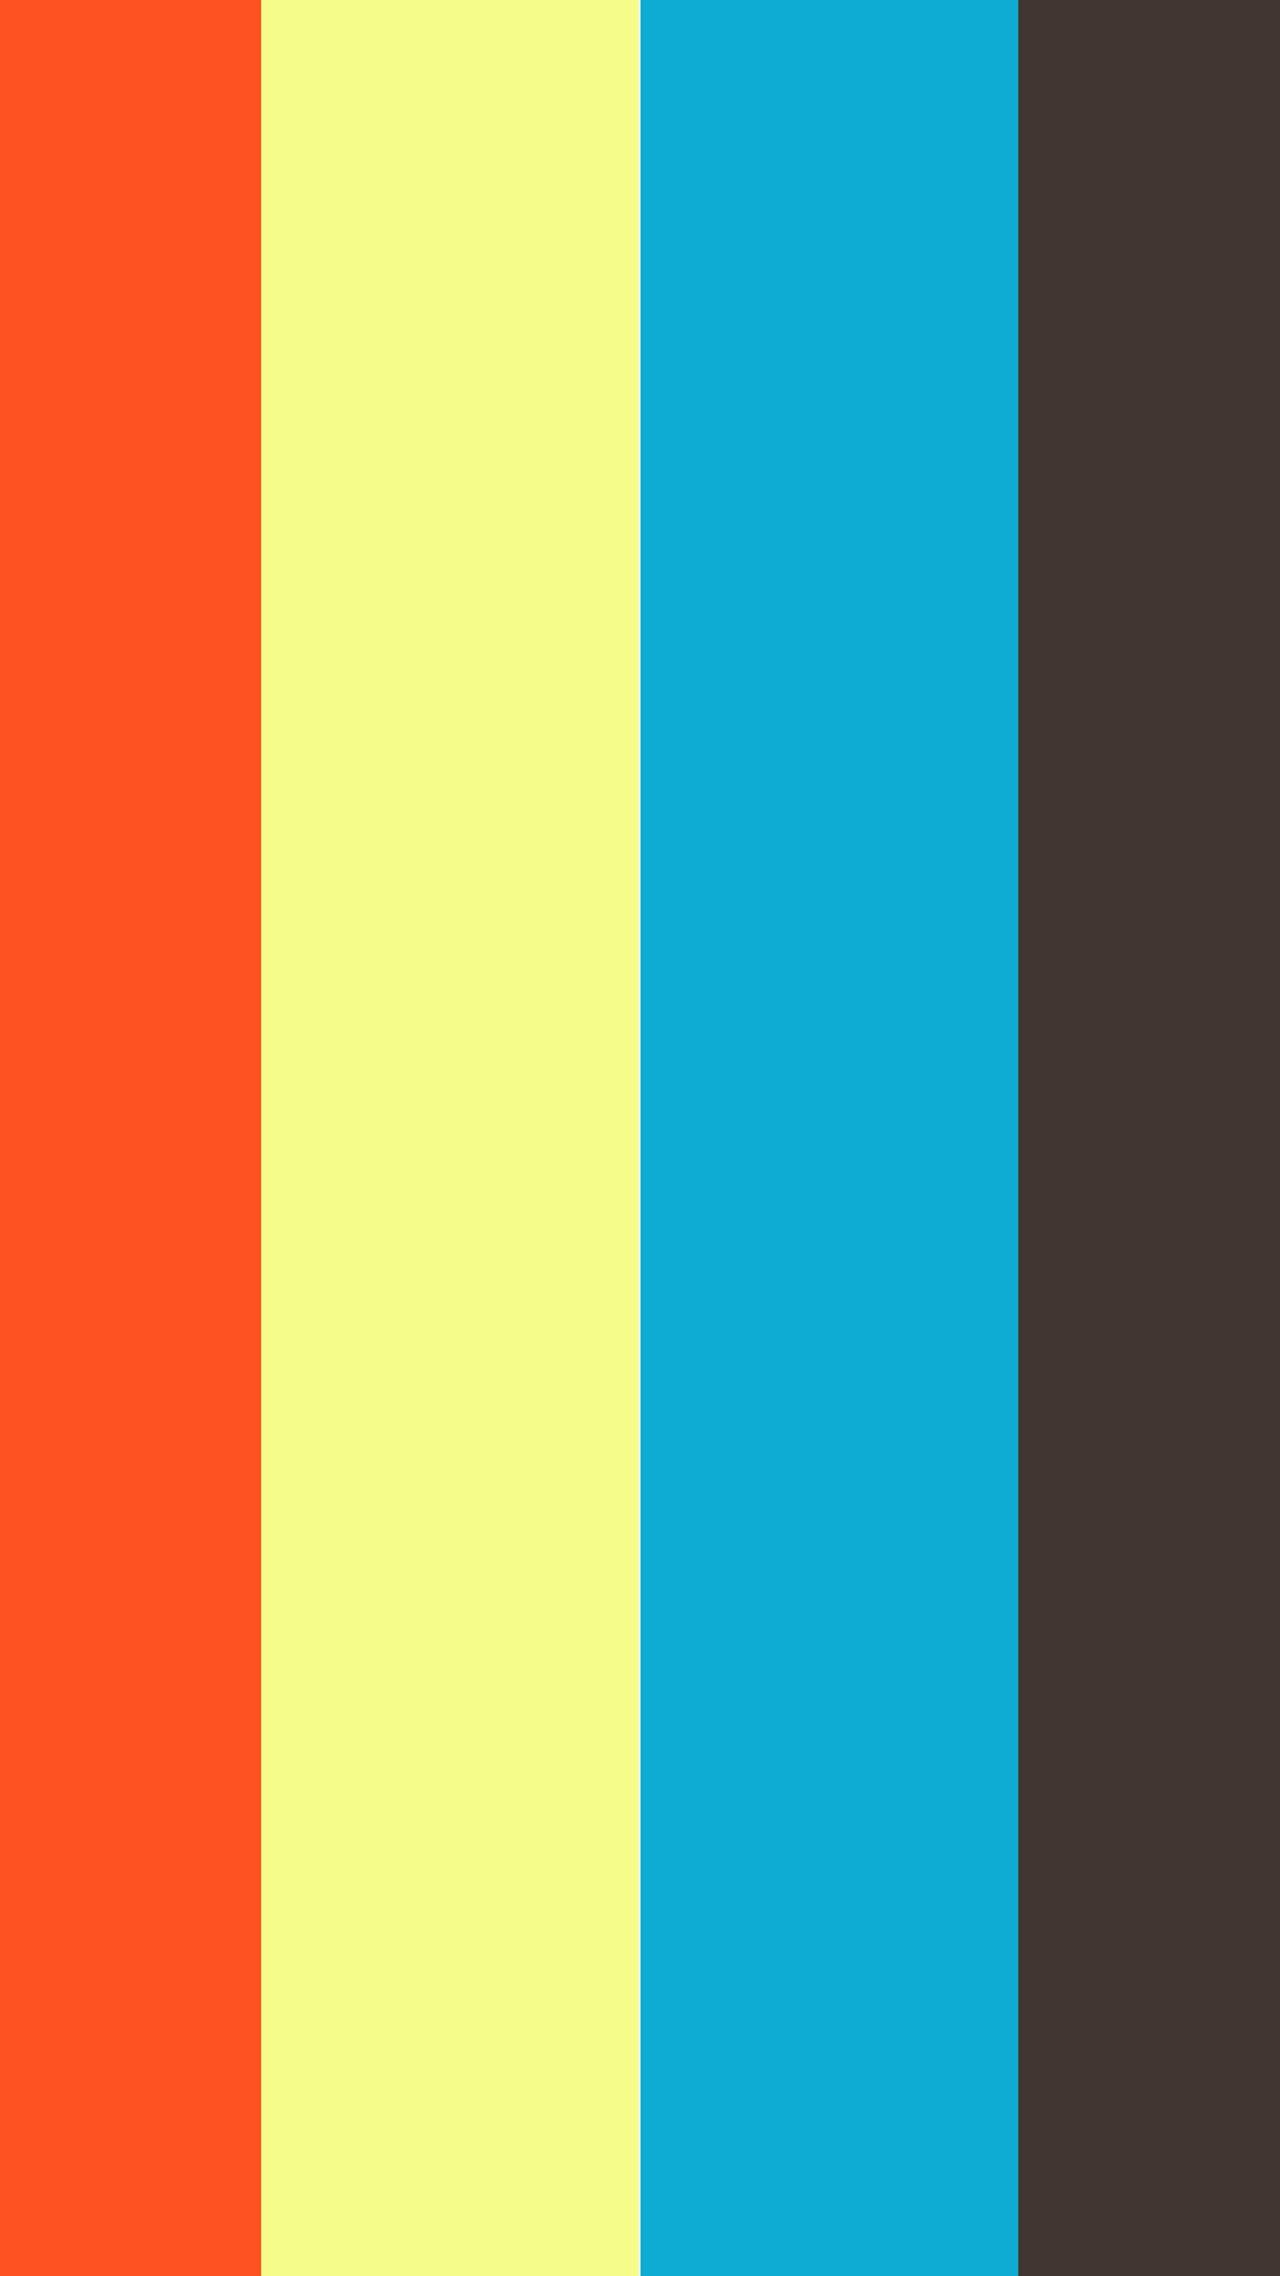 jett n jayden feb 2014 st louis hertz car rental with grandma renting car on vimeo. Black Bedroom Furniture Sets. Home Design Ideas